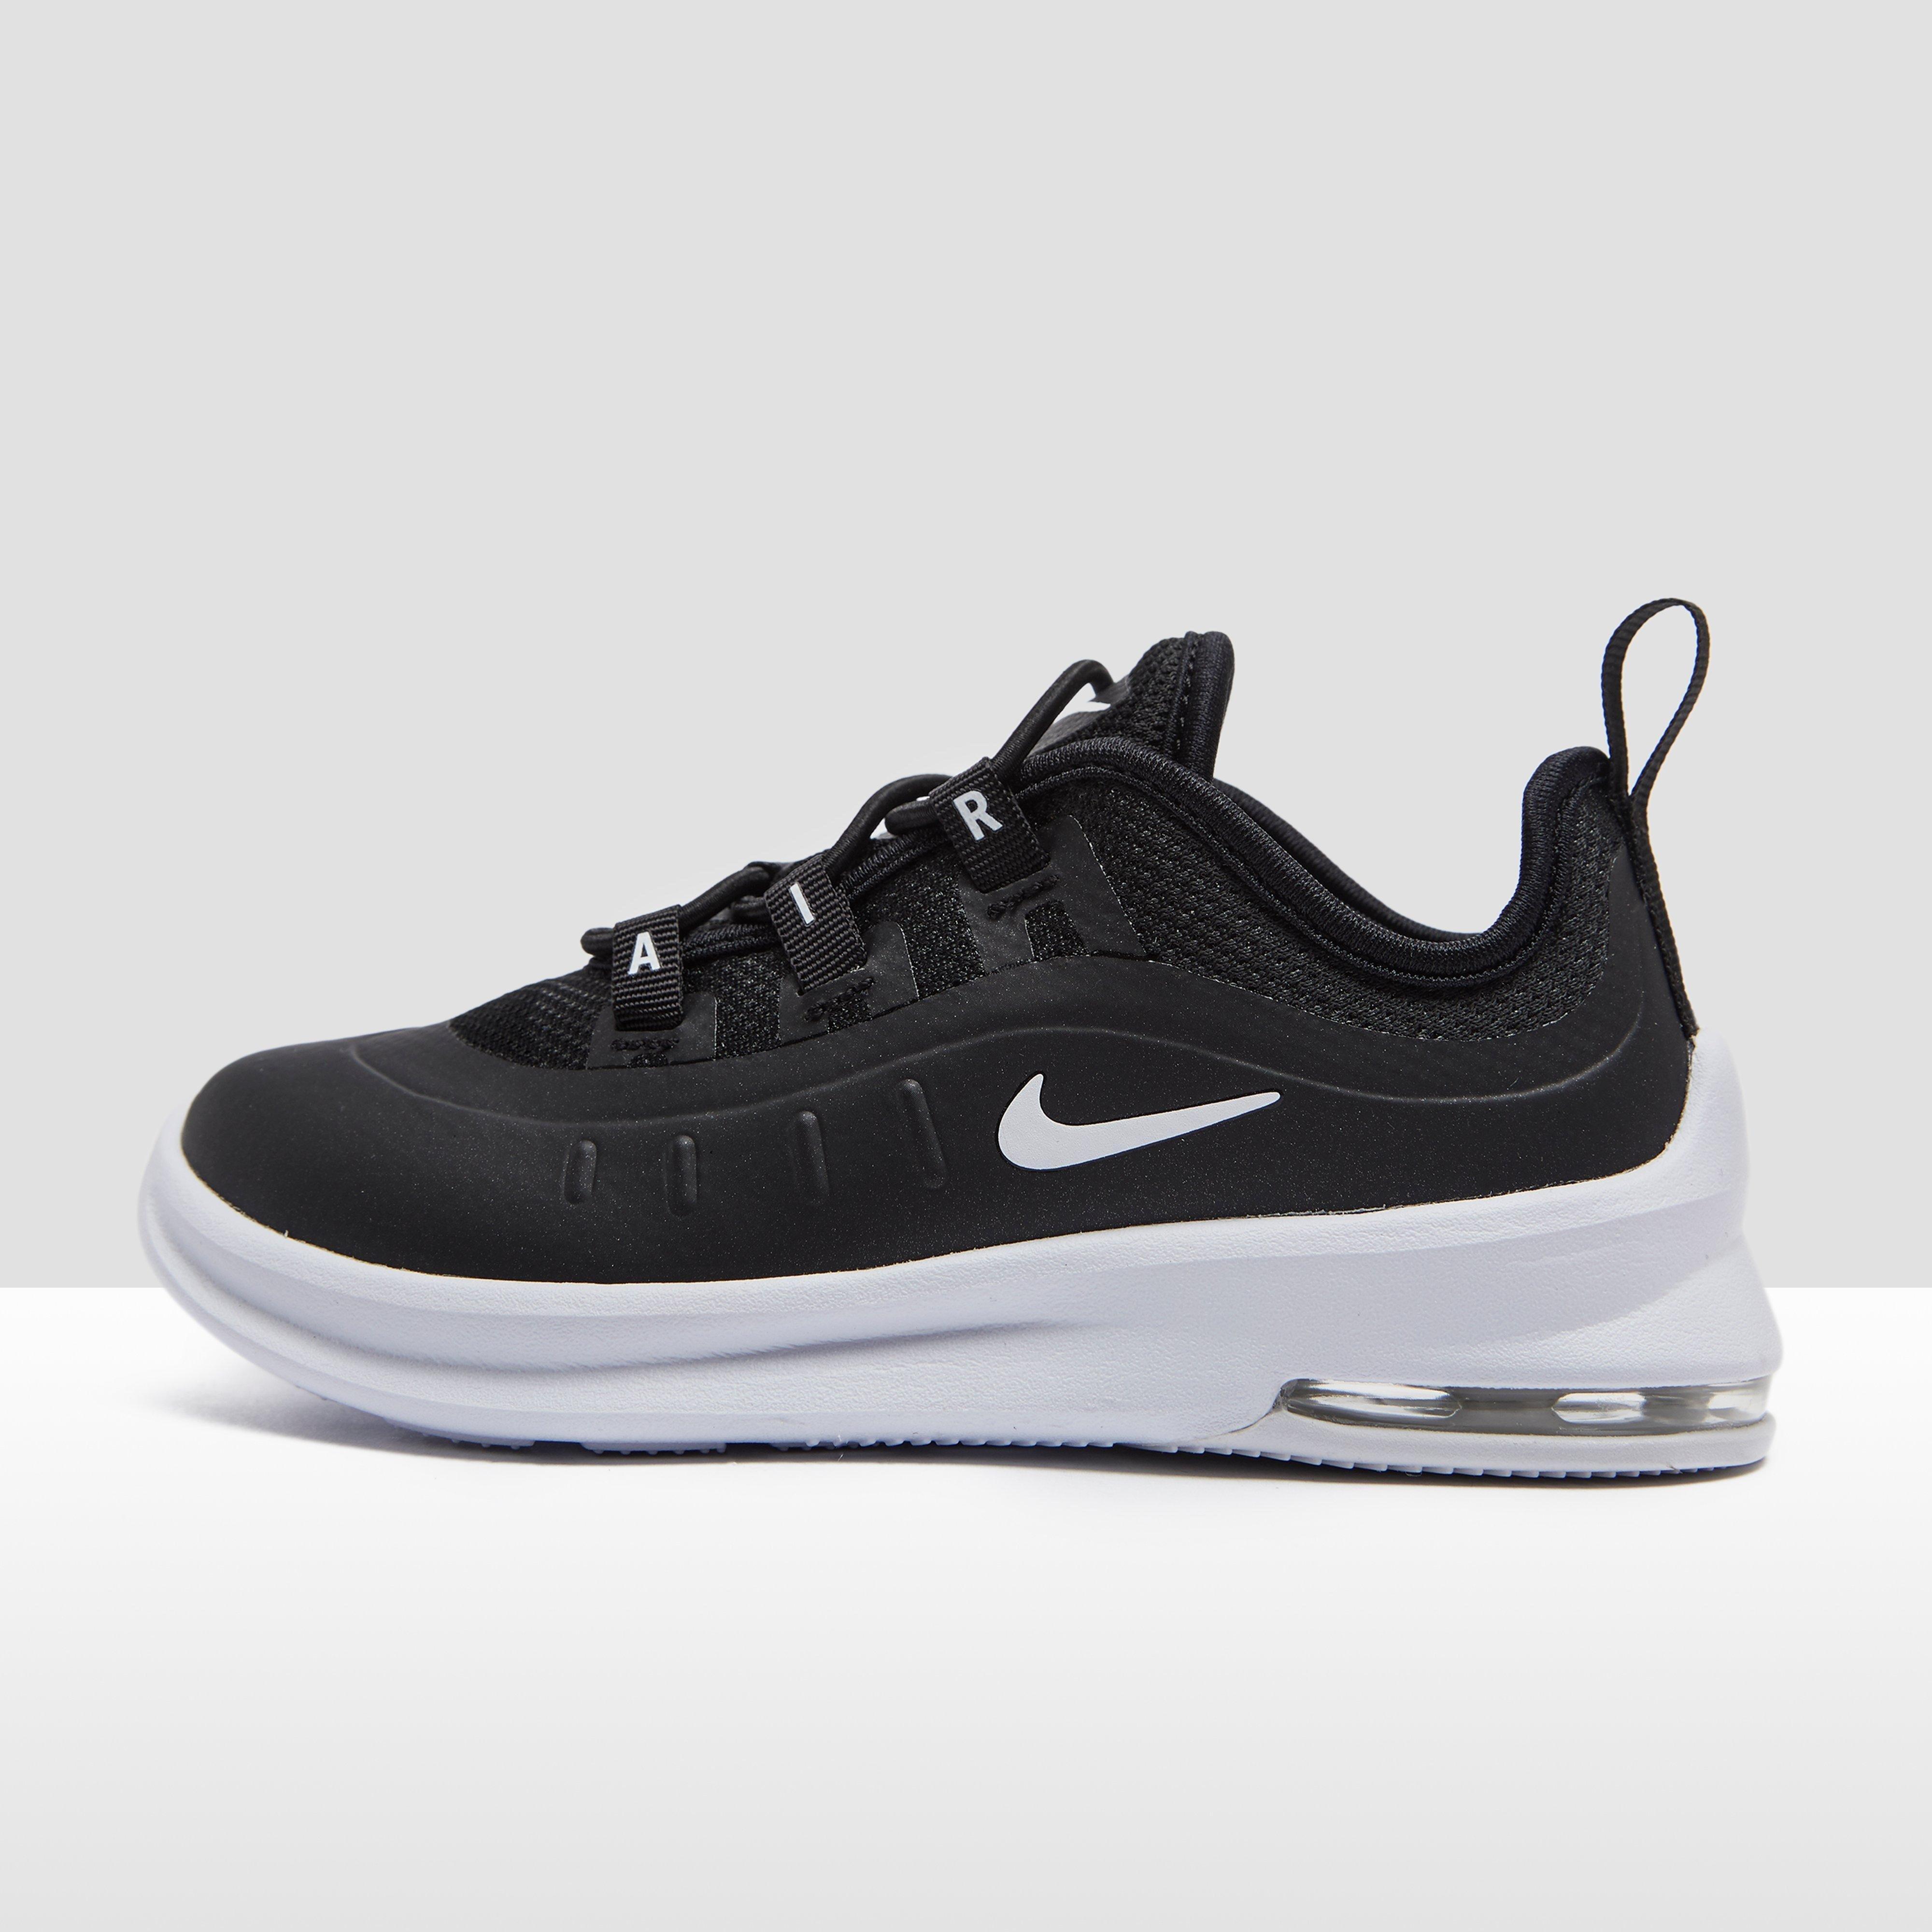 Air max 97 rood   Sneakers mode, Tennisschoenen, Nike